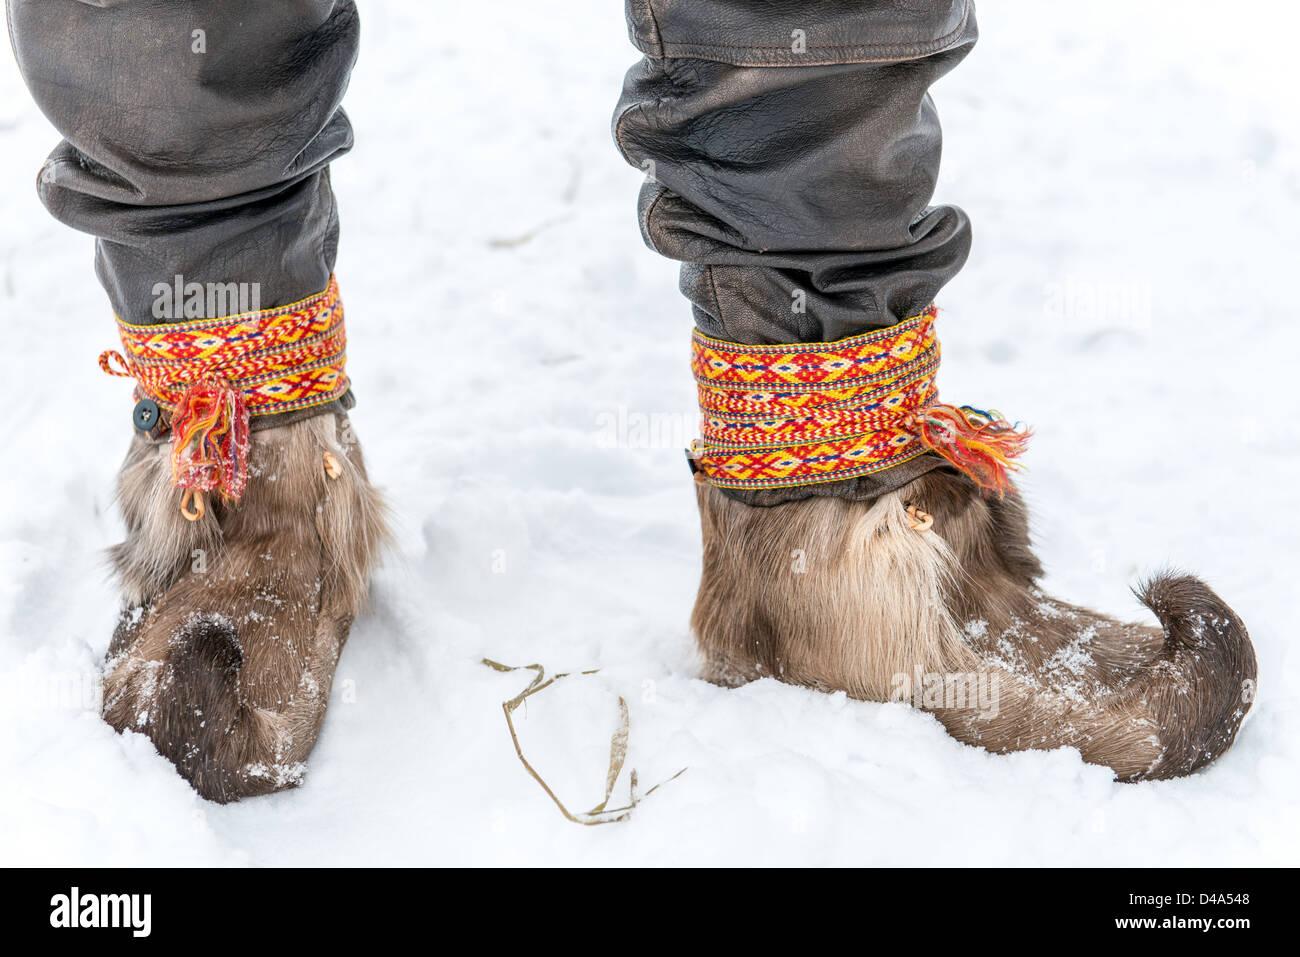 Sami people man Swedish Lapland  Sweden Scandinavia - Stock Image